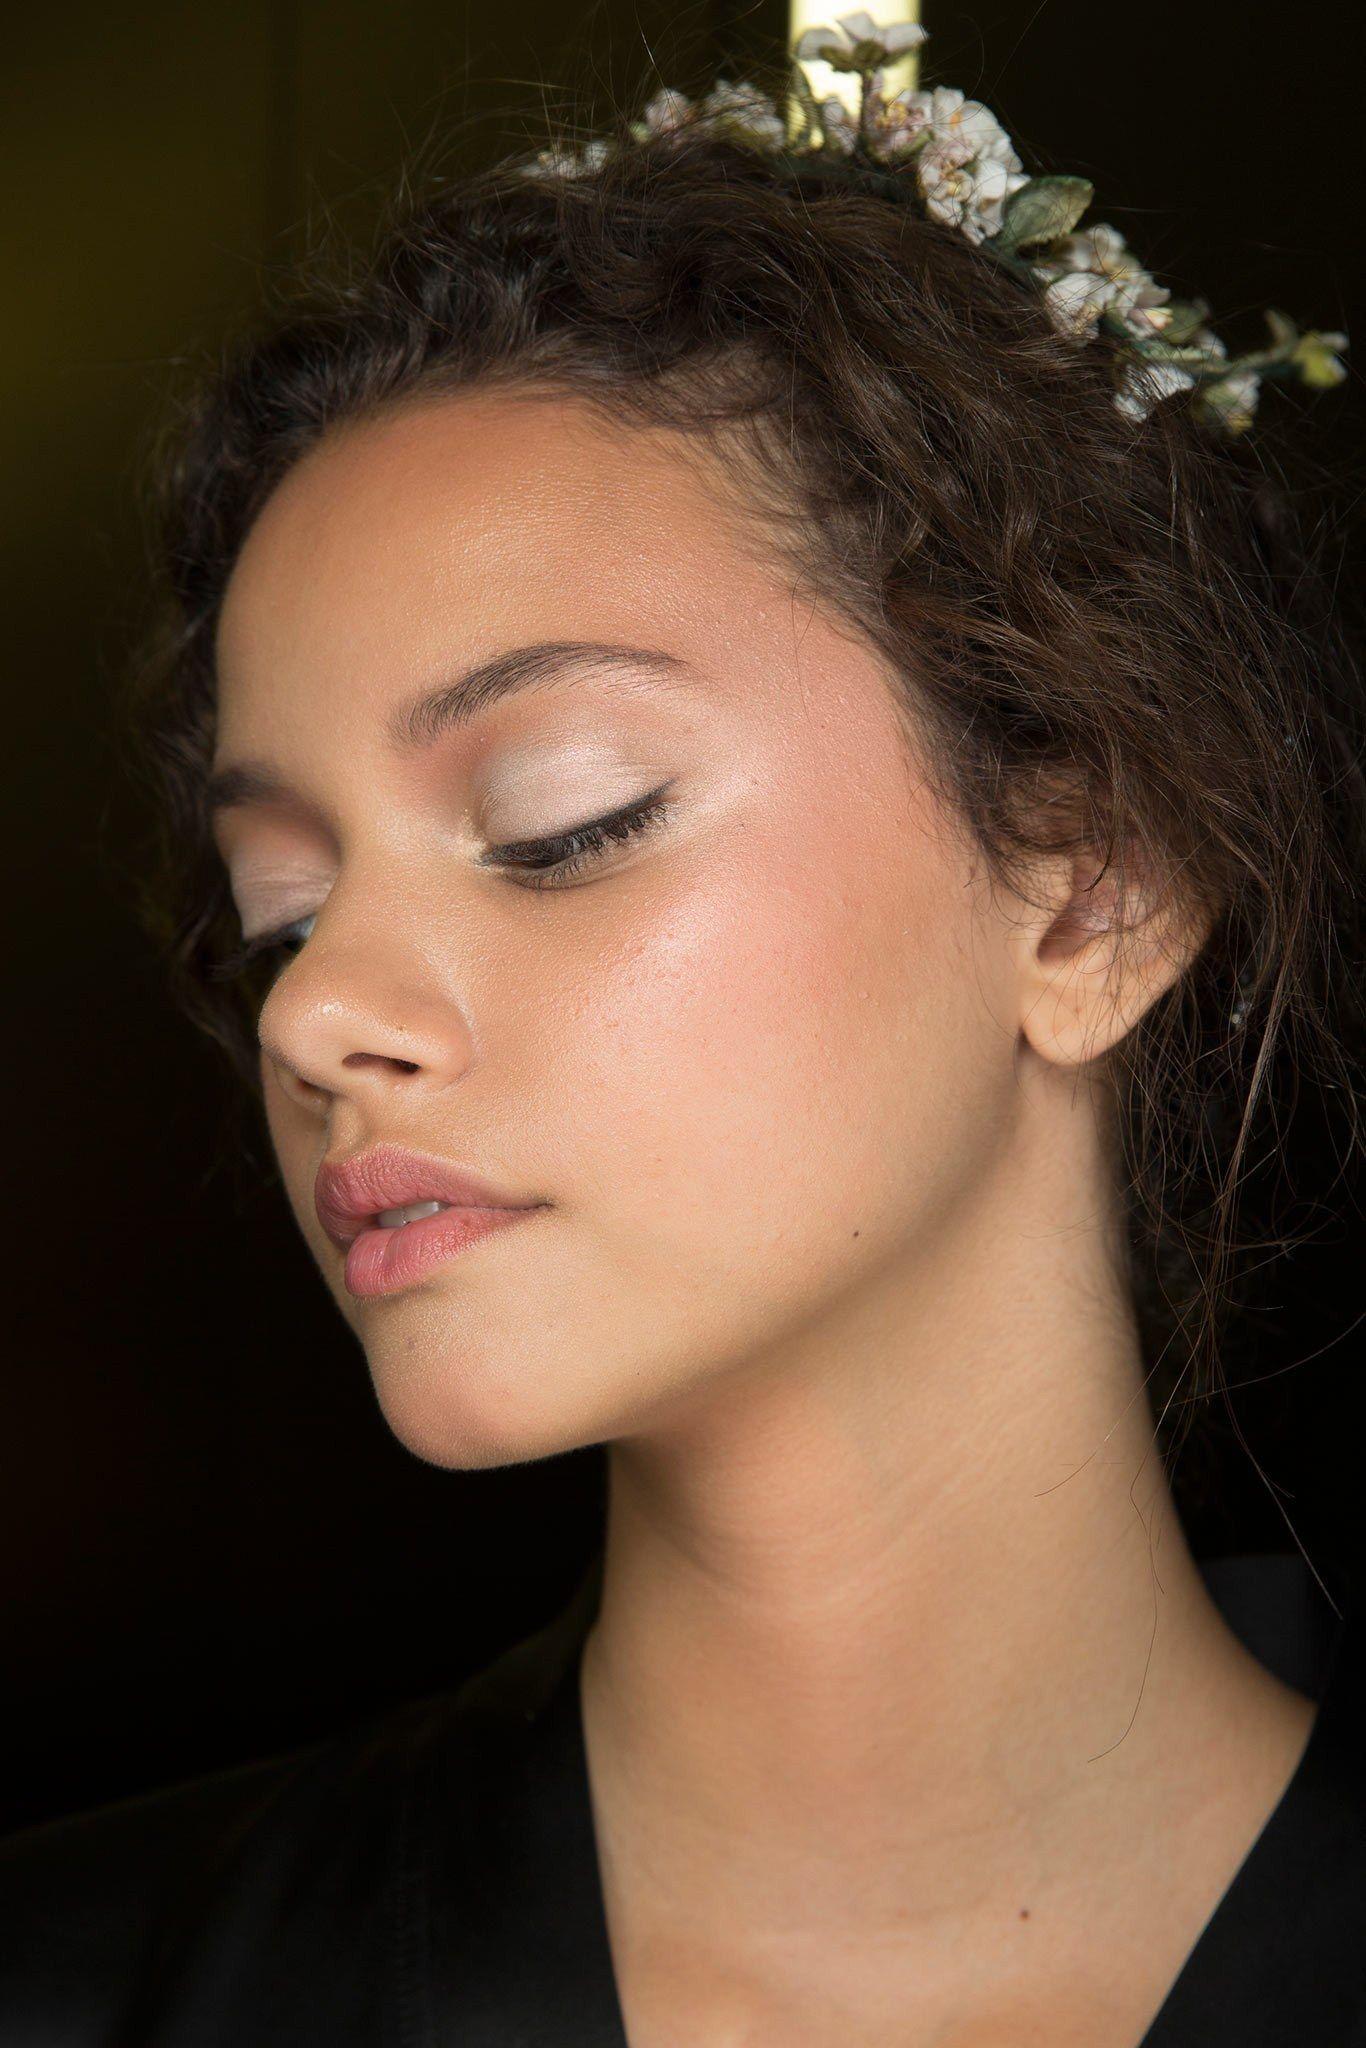 Dolce & Gabbana Spring 2014 Ready-to-Wear Beauty Photos - Vogue